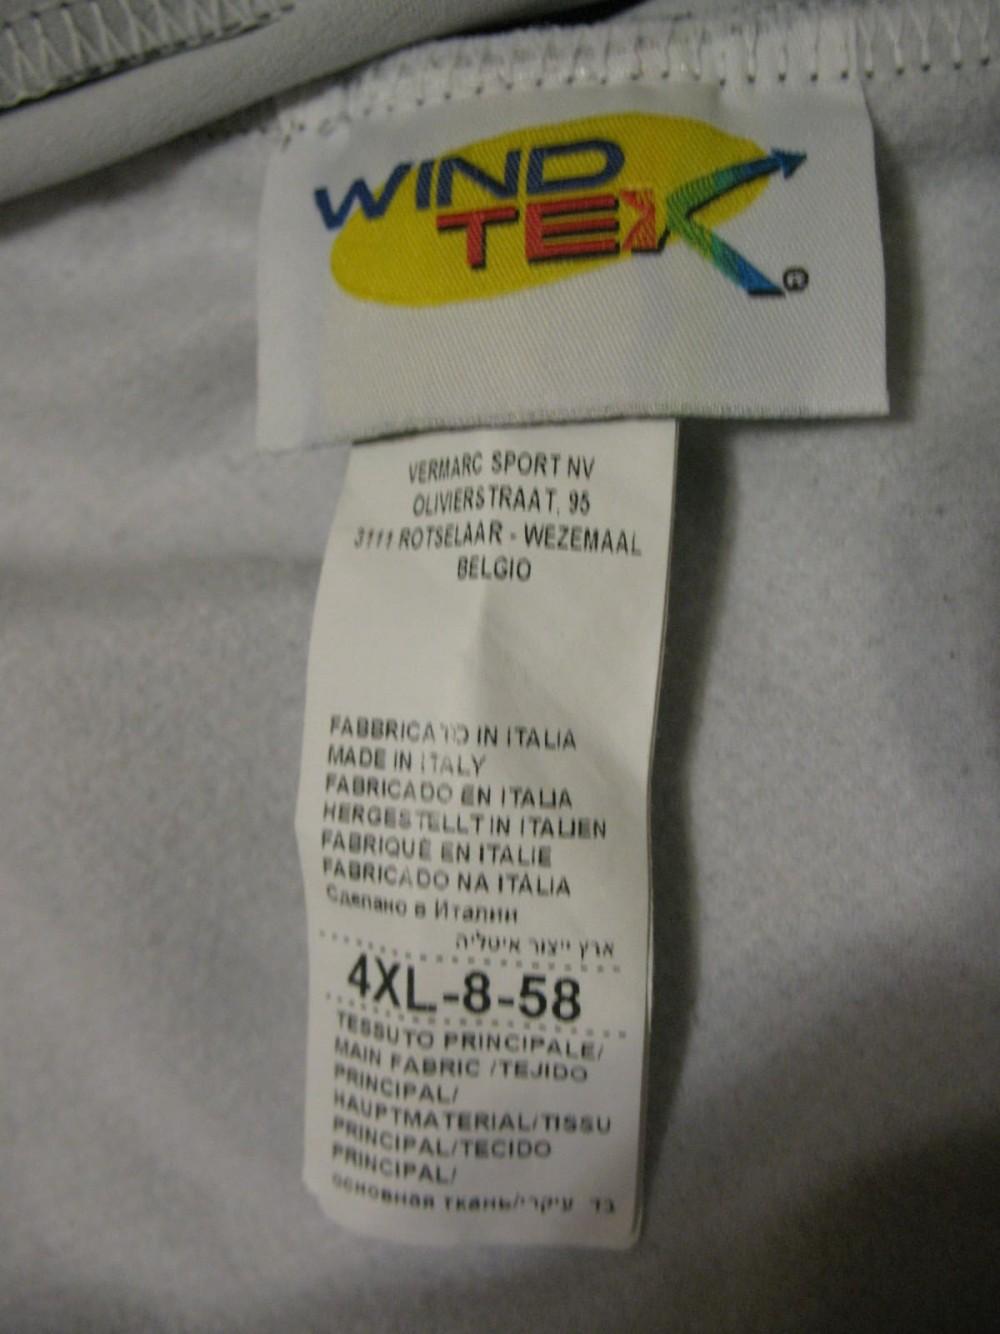 Велокуртка VERMARC kolmont windtex cycling jacket (размер 8-58-4XL) - 5